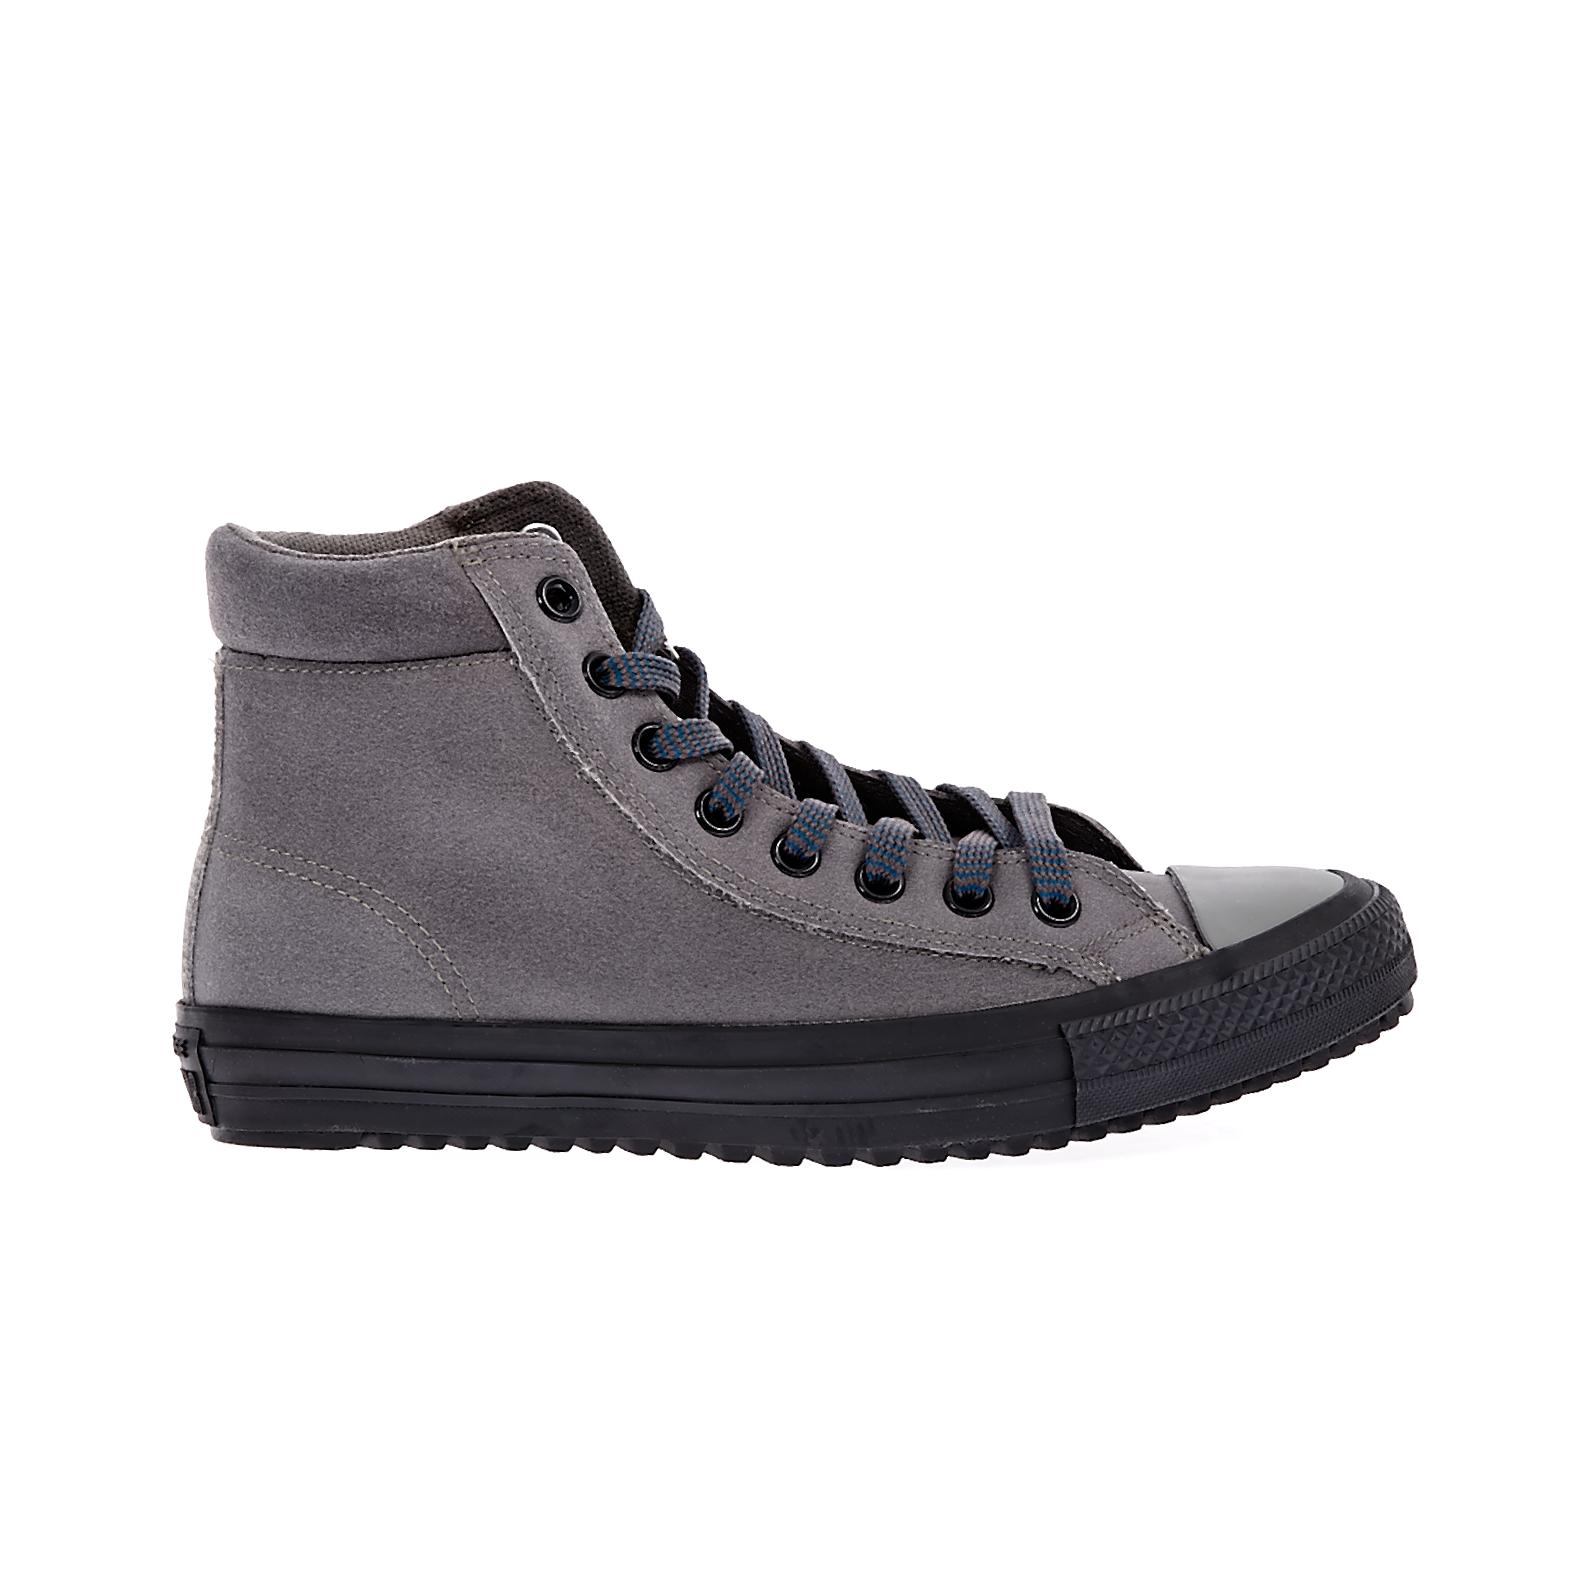 CONVERSE – Unisex παπούτσια Chuck Taylor All Star Converse γκρι